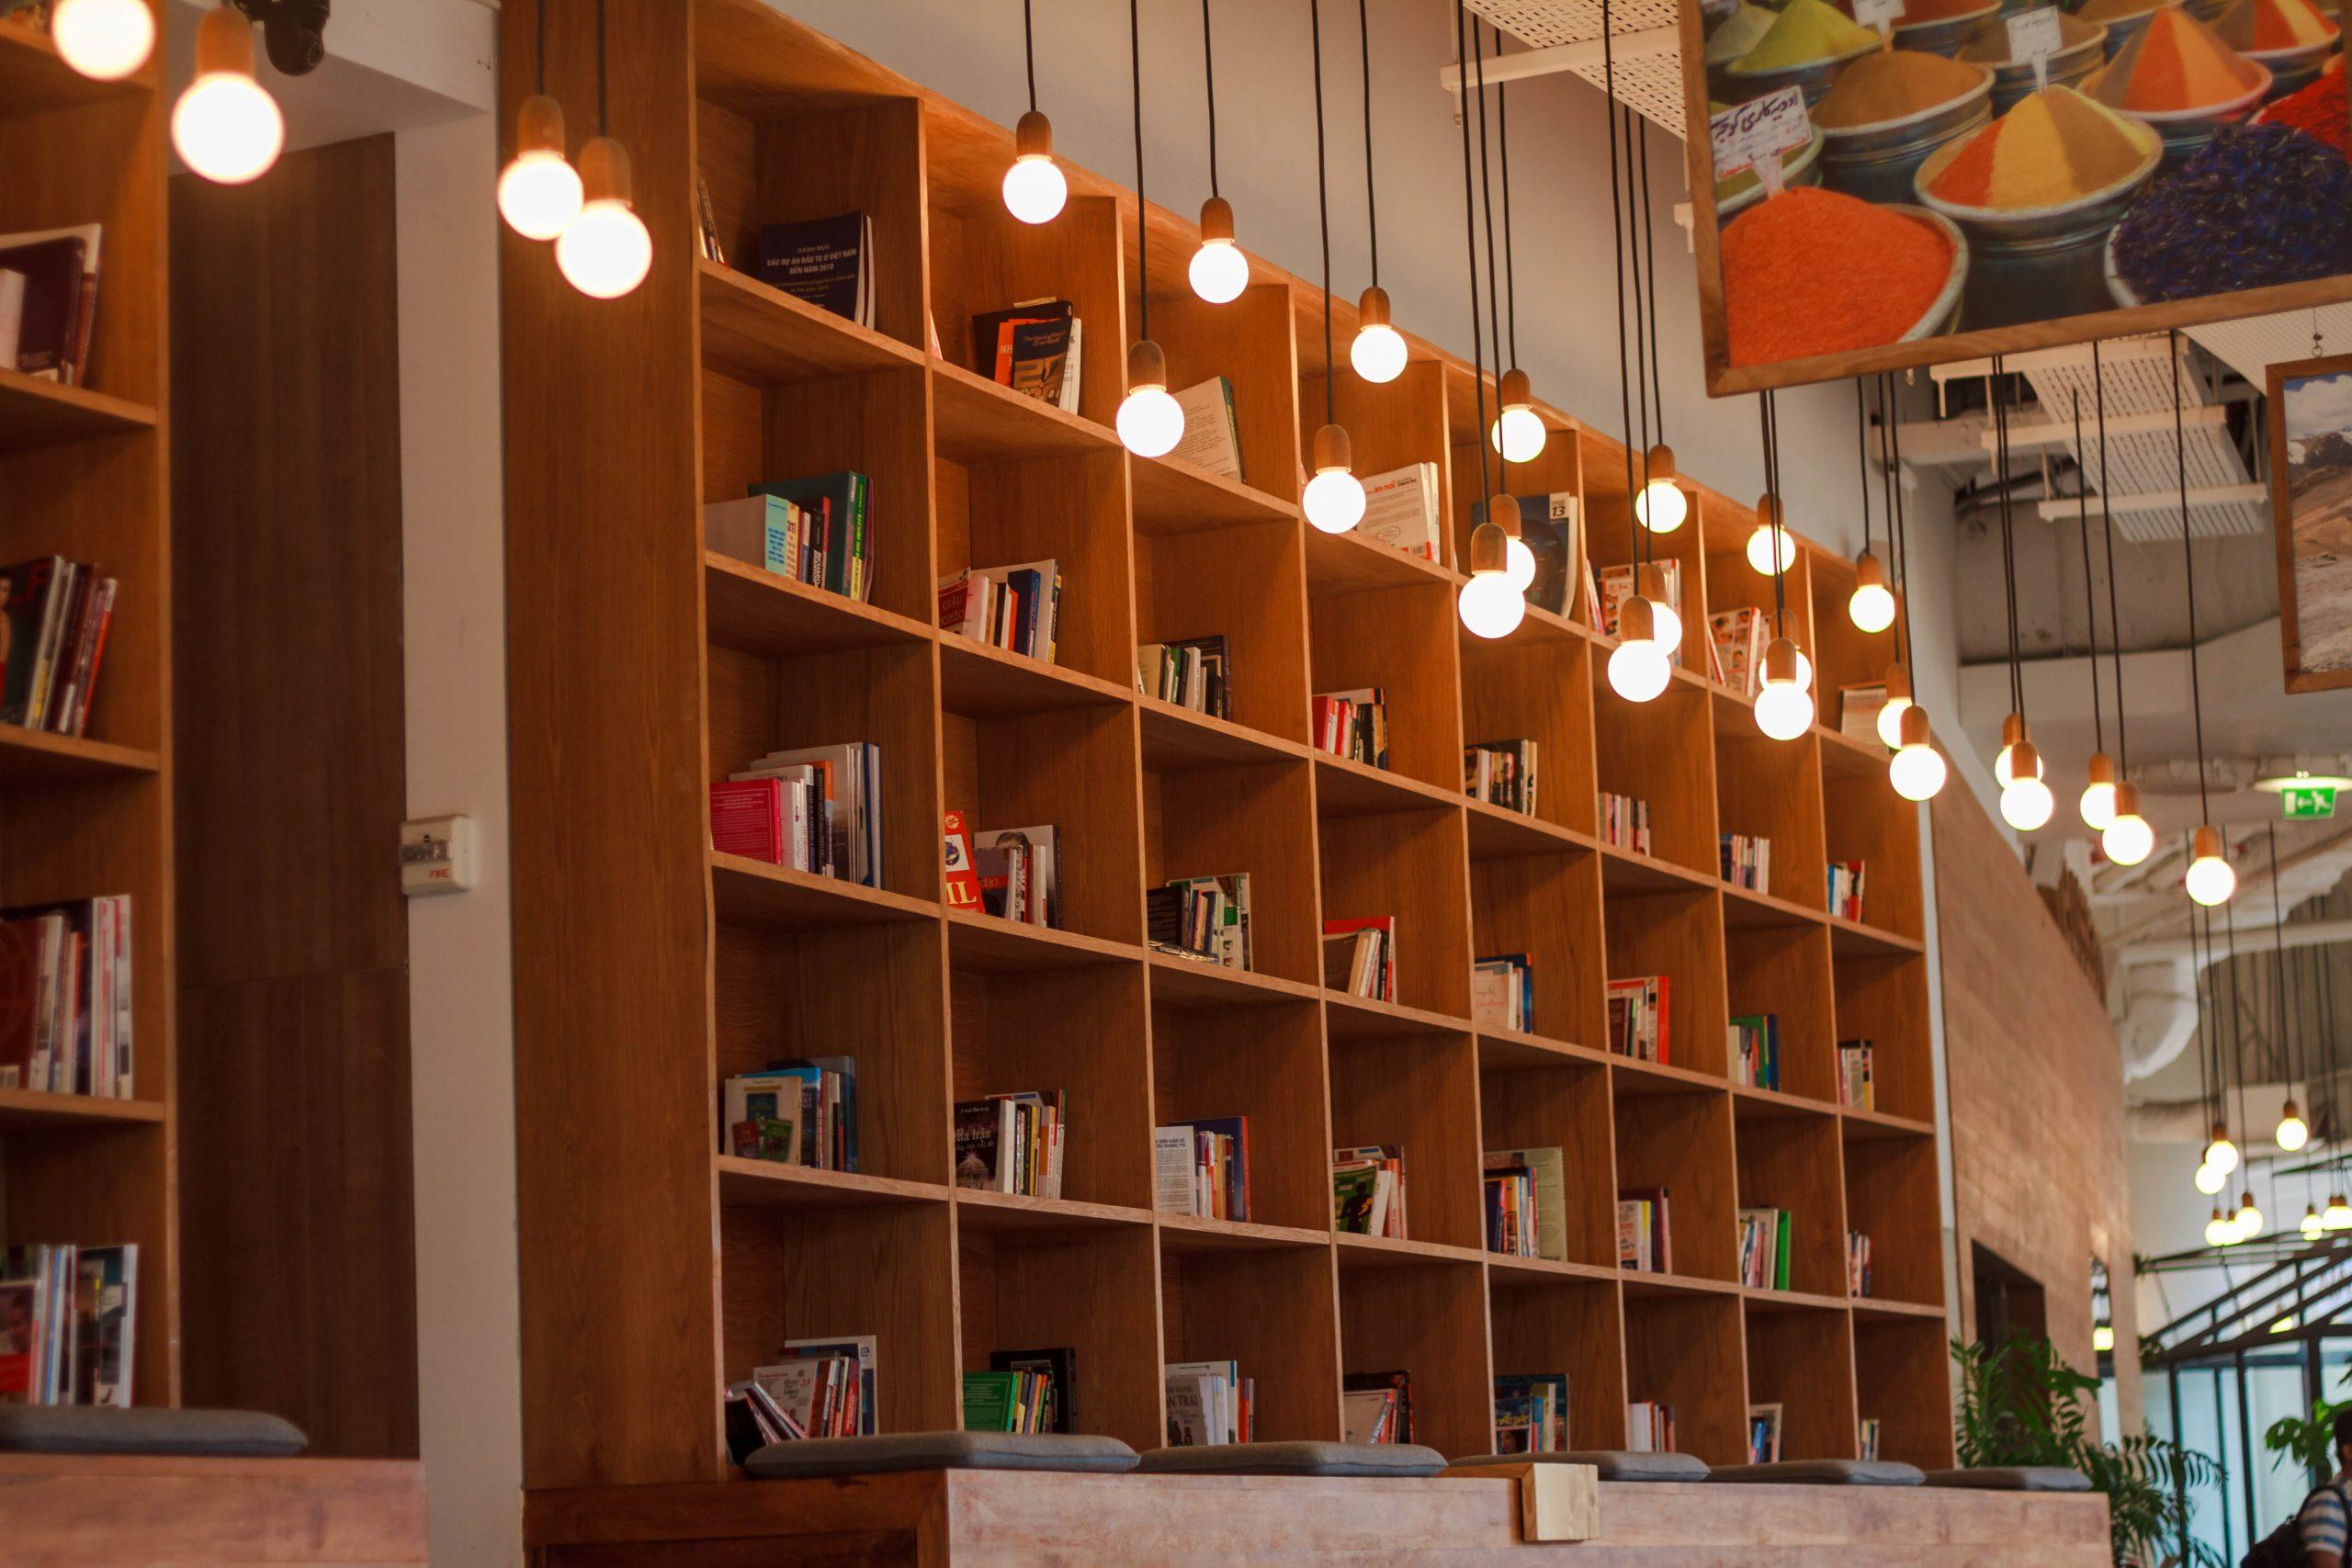 architecture-book-shelves-books-commercial-eatablishment-244134